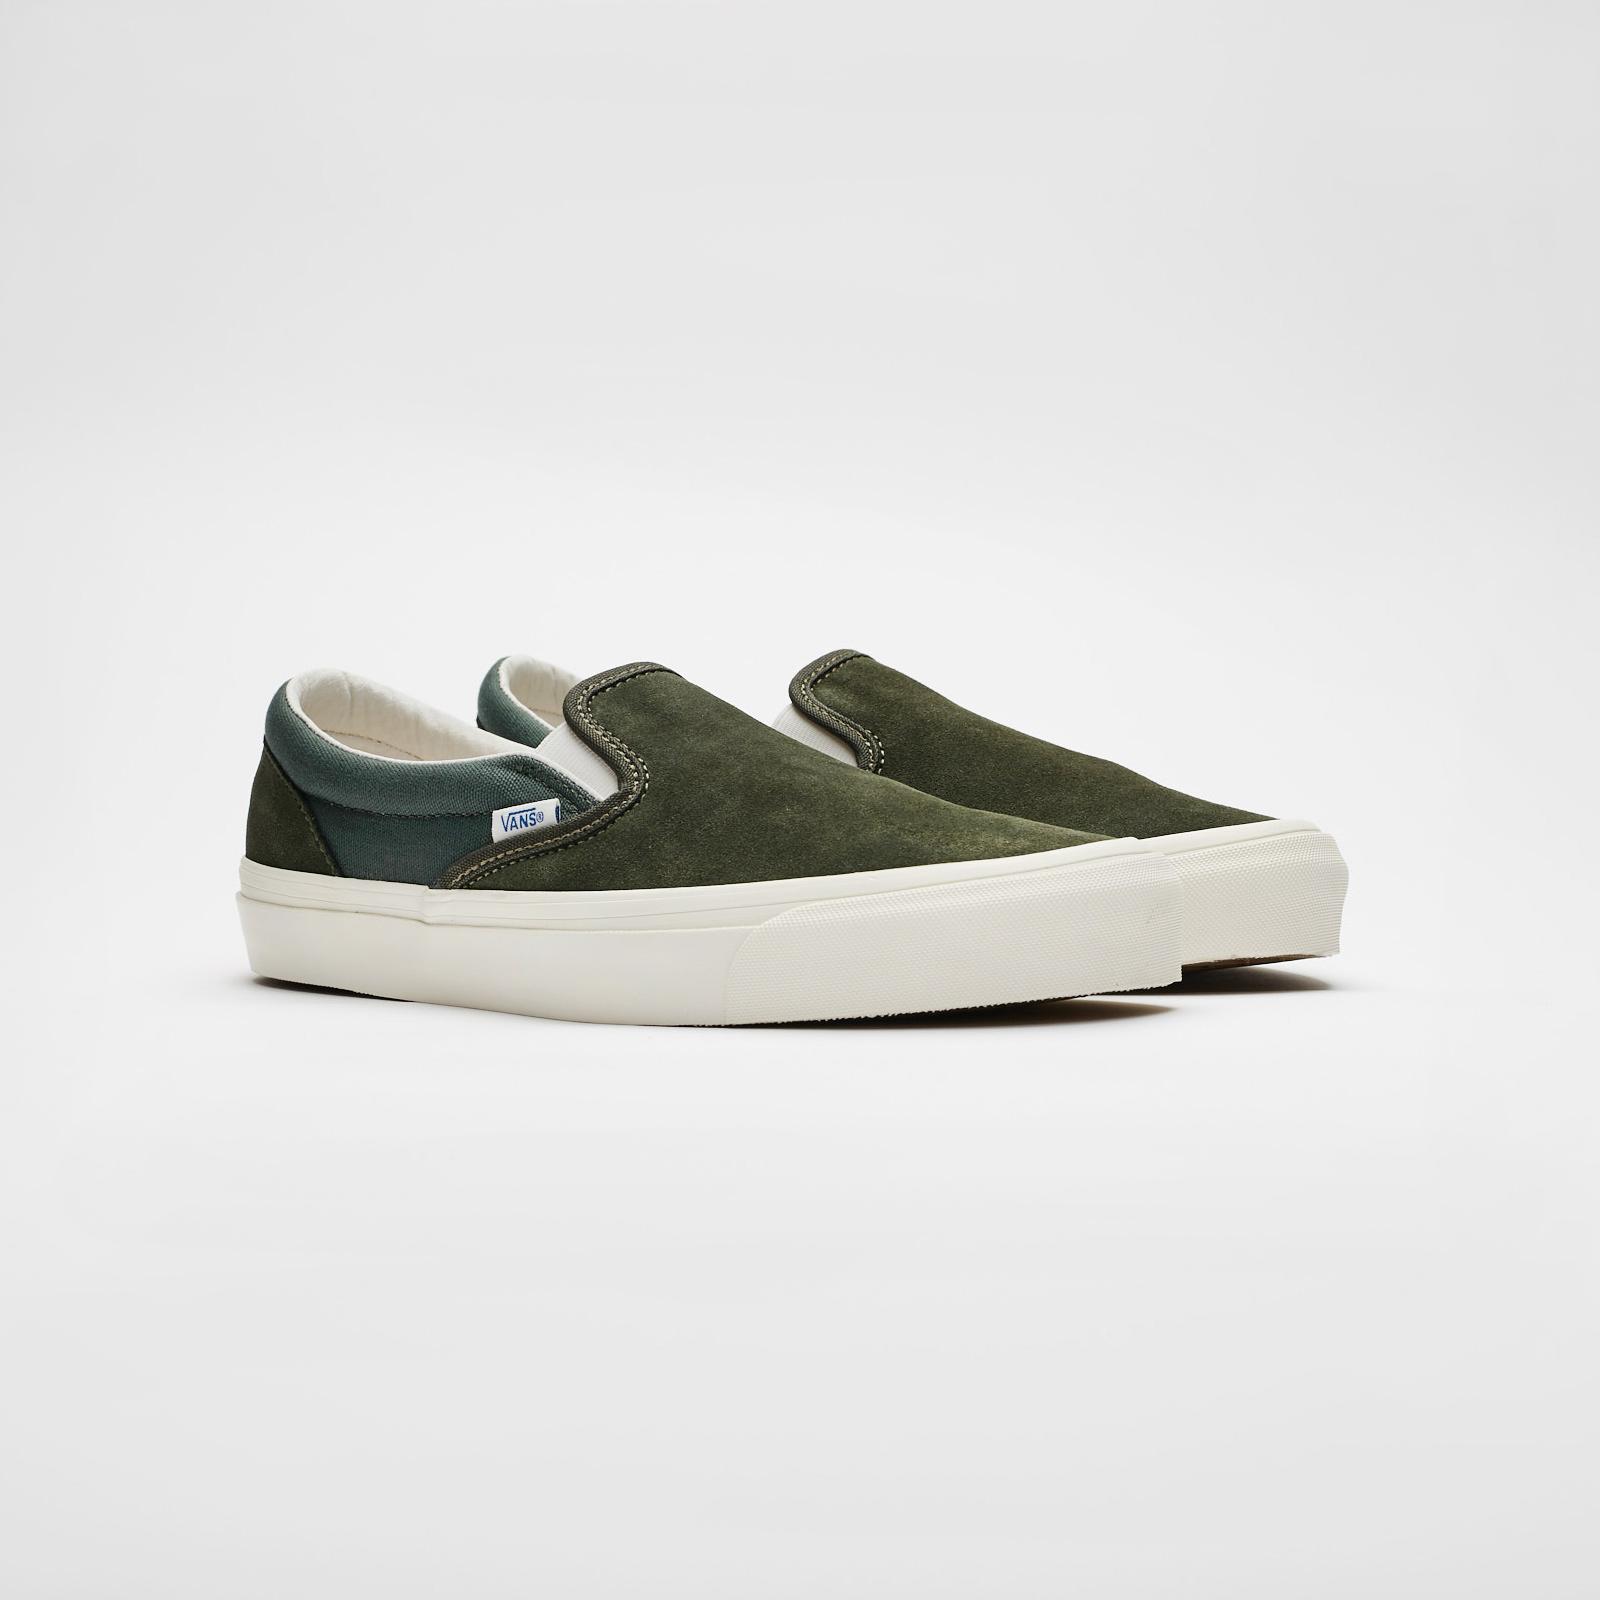 Vans UA OG Classic Slip-On LX - V00udfu9q - Sneakersnstuff ... aecd15fcb